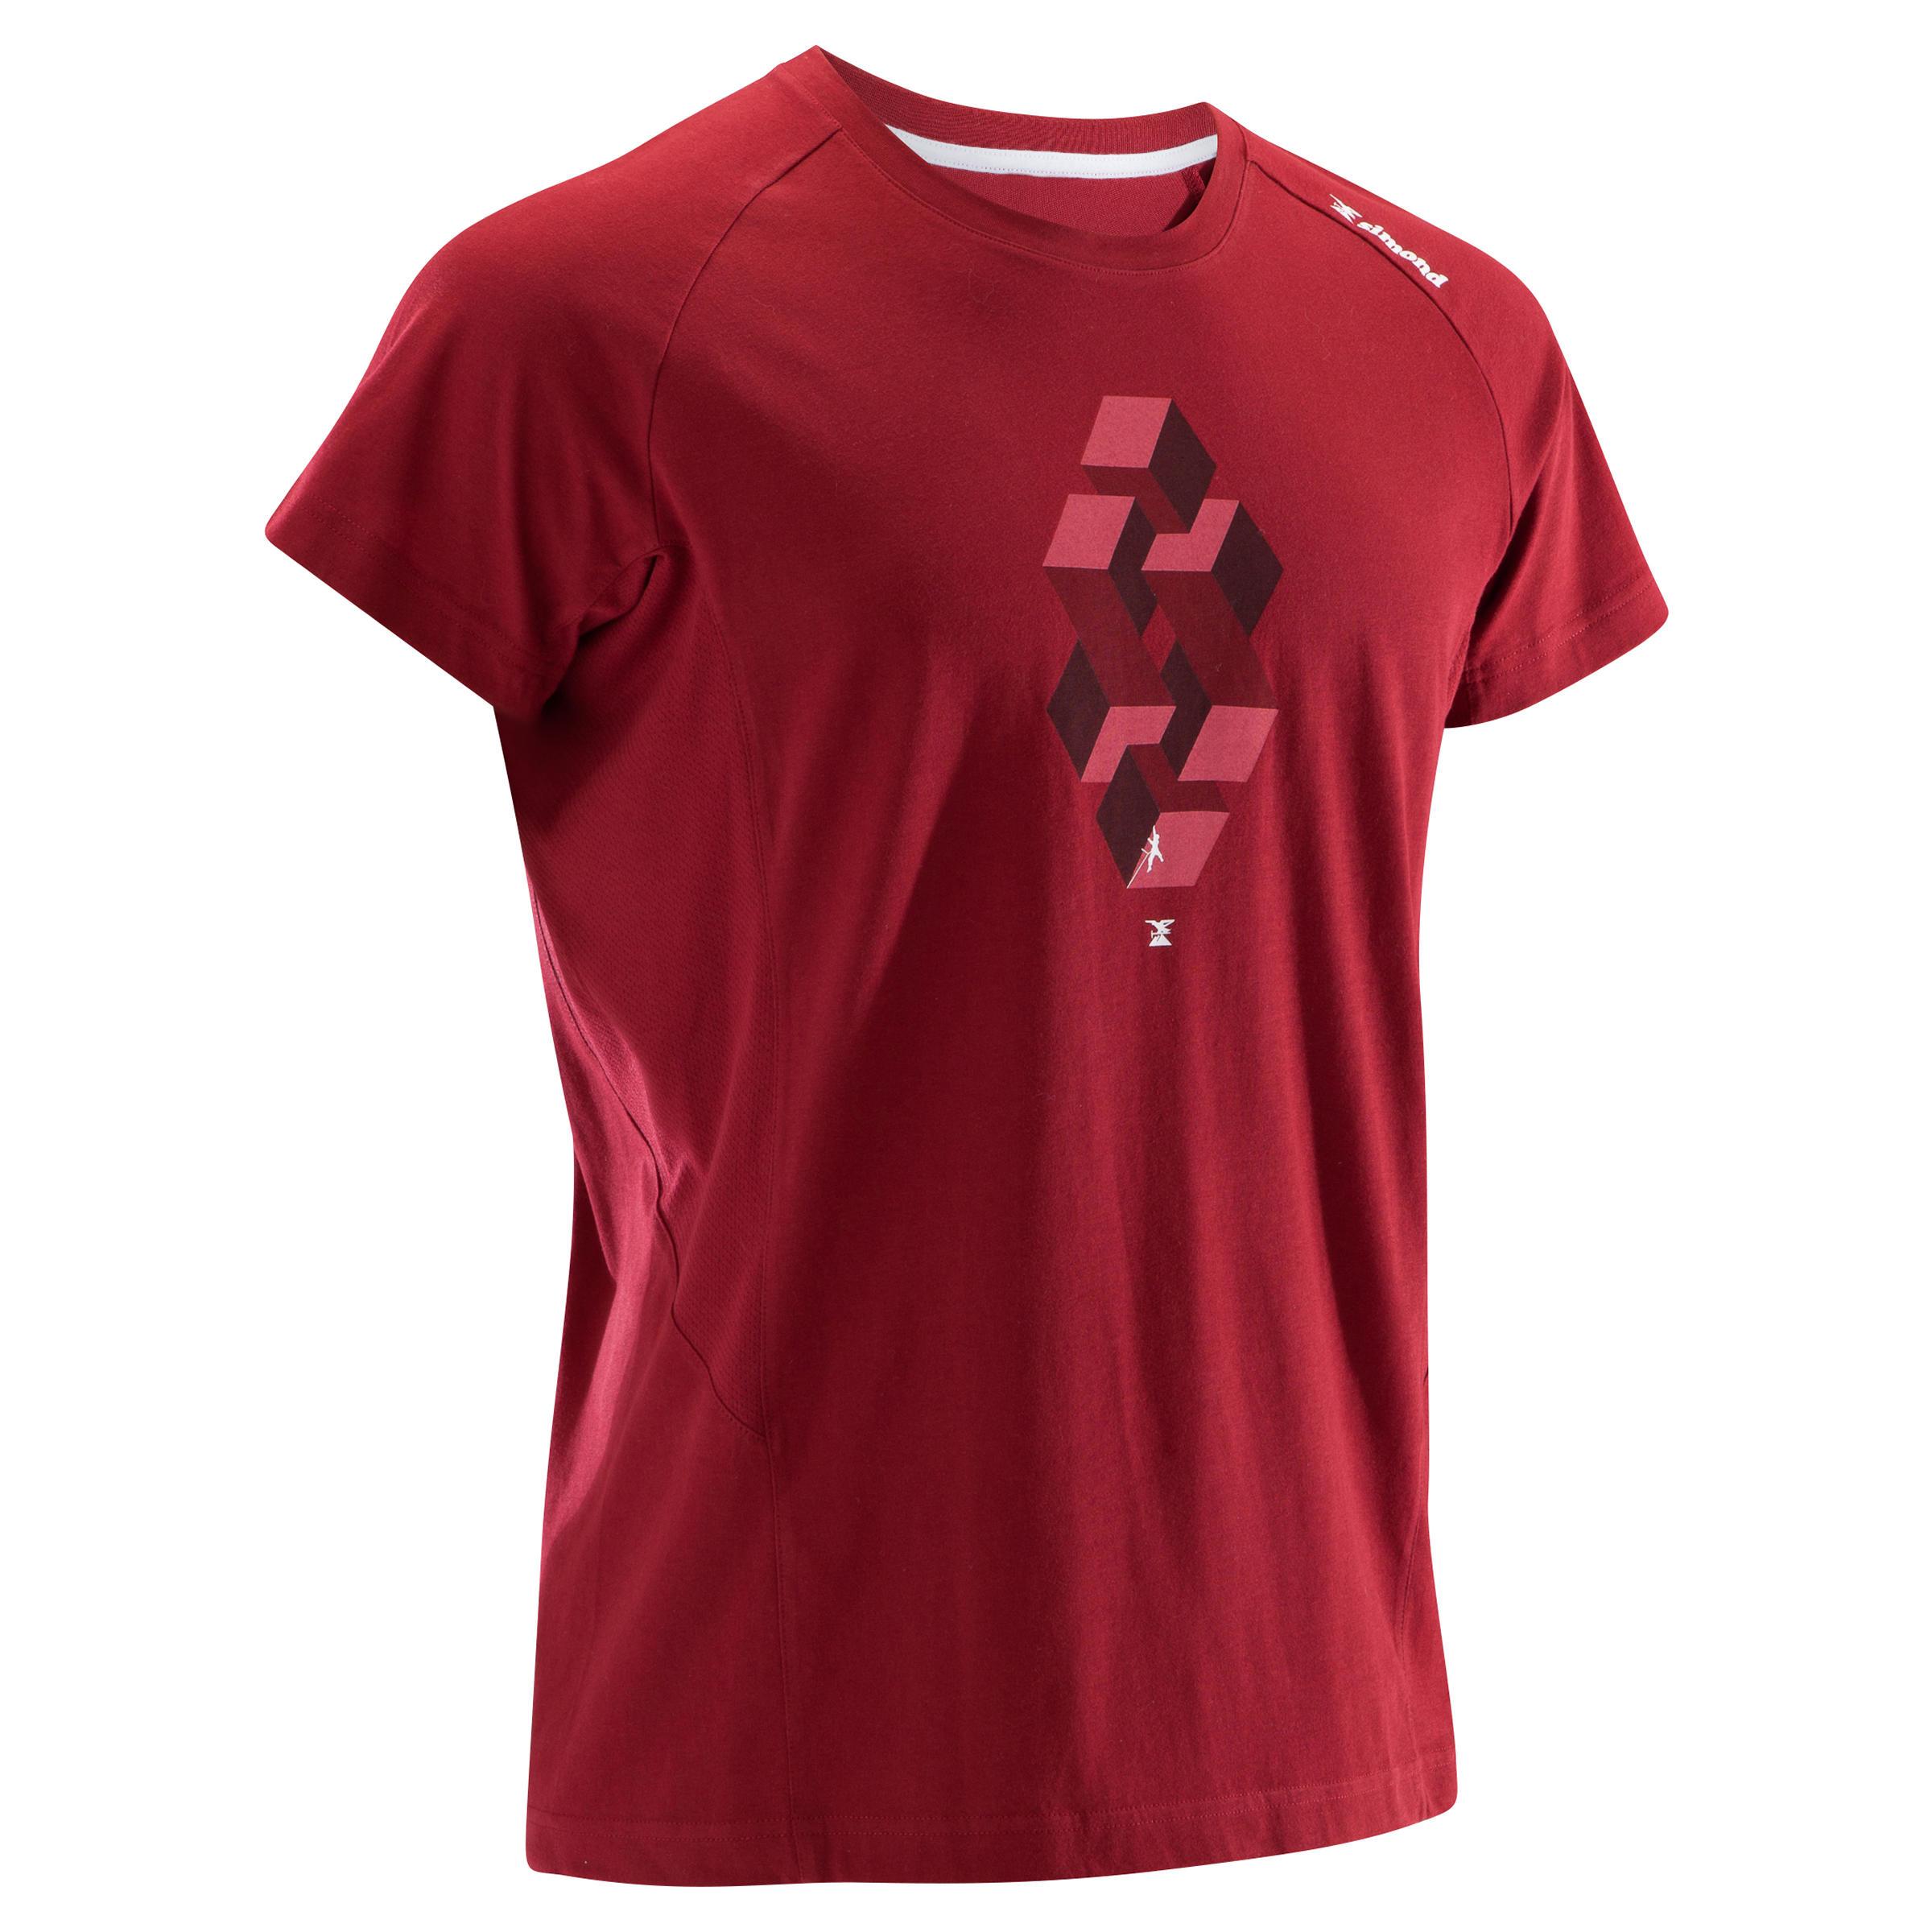 Kletter-T-Shirt kurzarm Komfort Herren bordeauxrot | Sportbekleidung > Sportshirts > Klettershirts | Simond